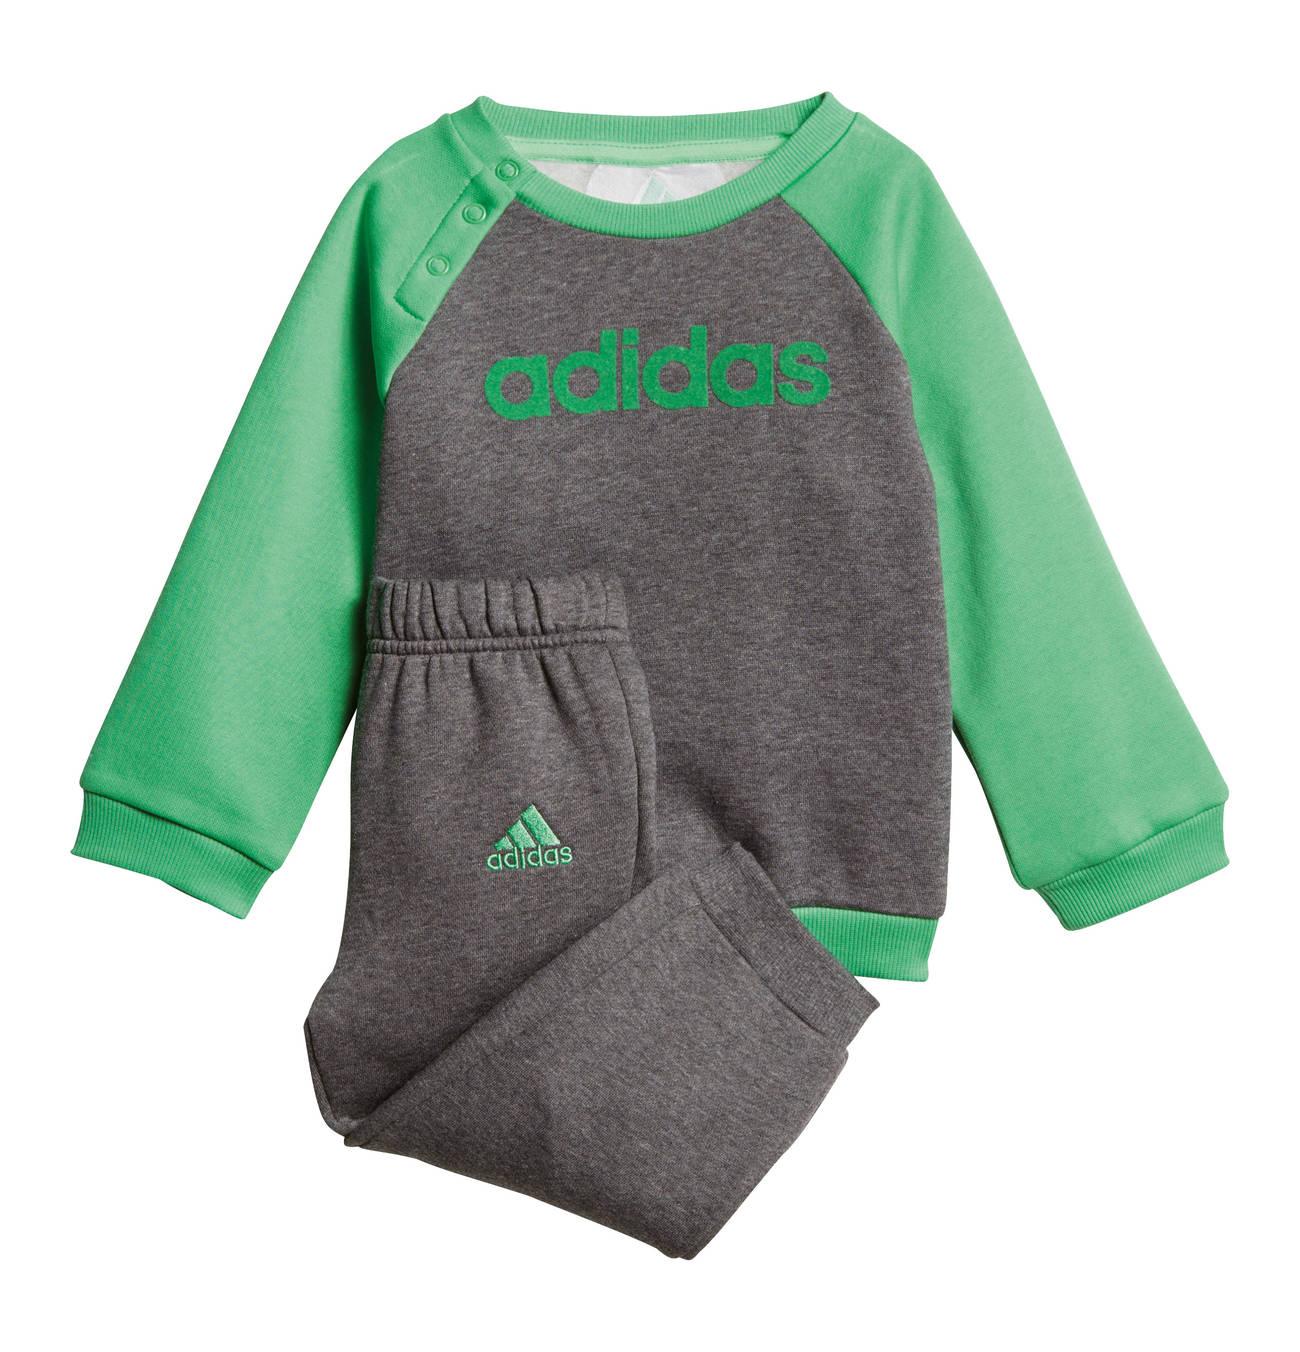 Adidas Babysachen